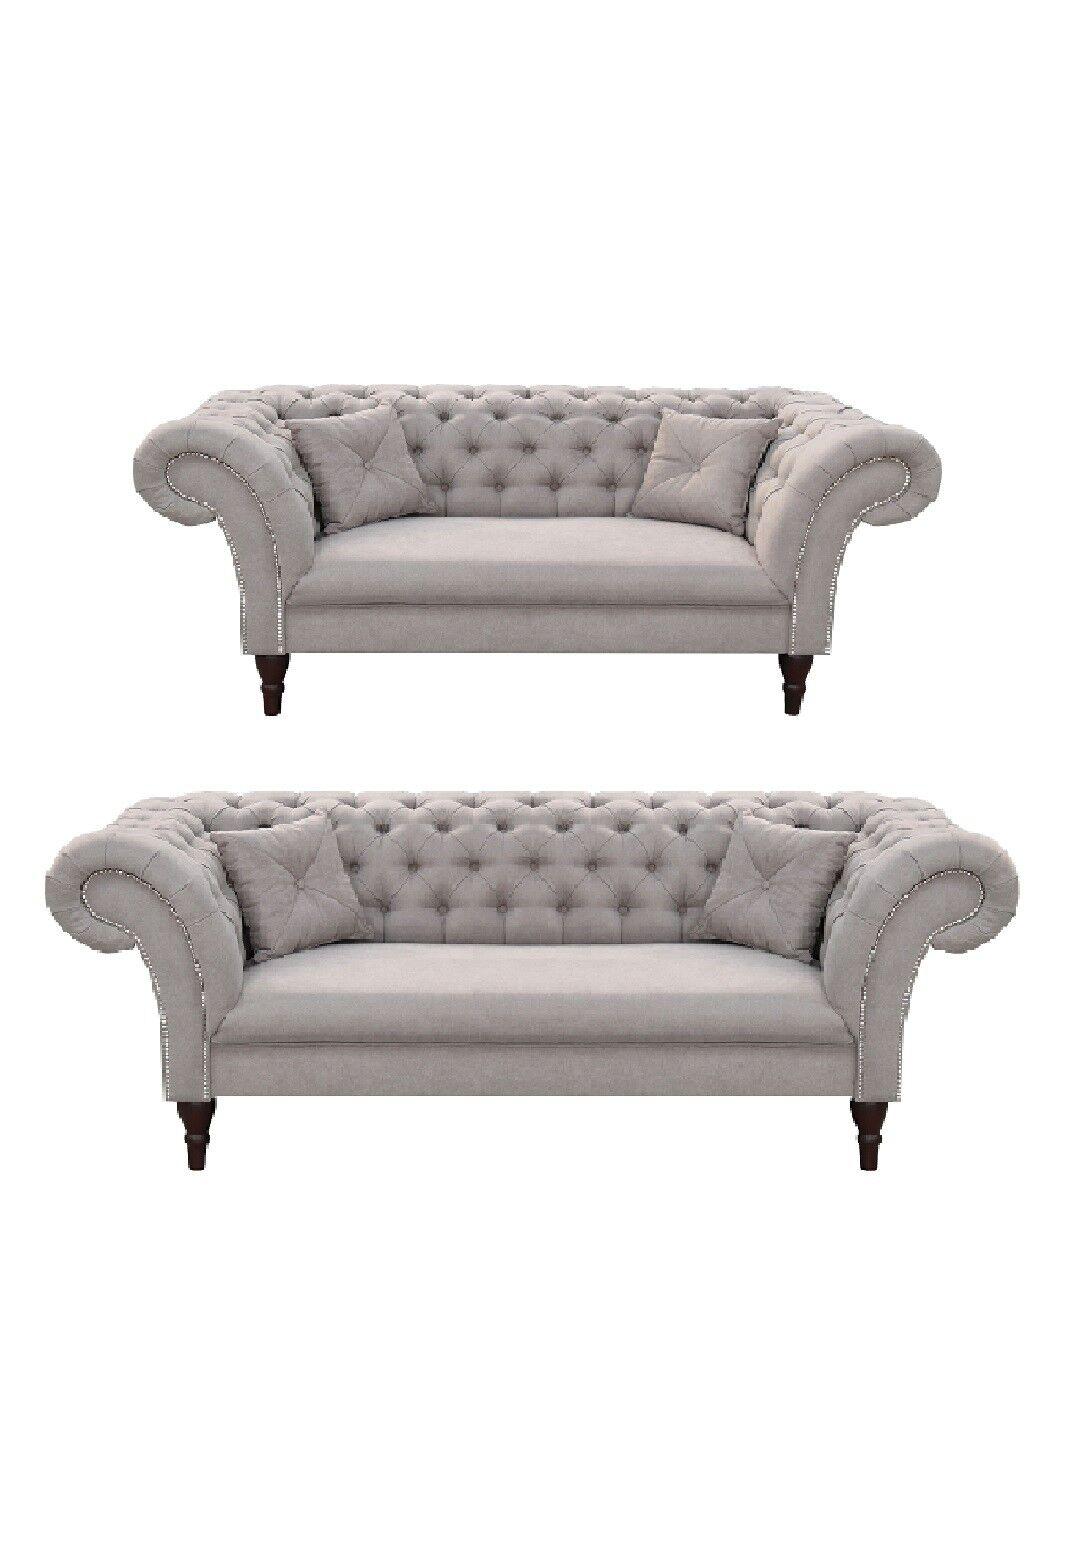 Buro Sofa Test Vergleich Buro Sofa Gunstig Kaufen